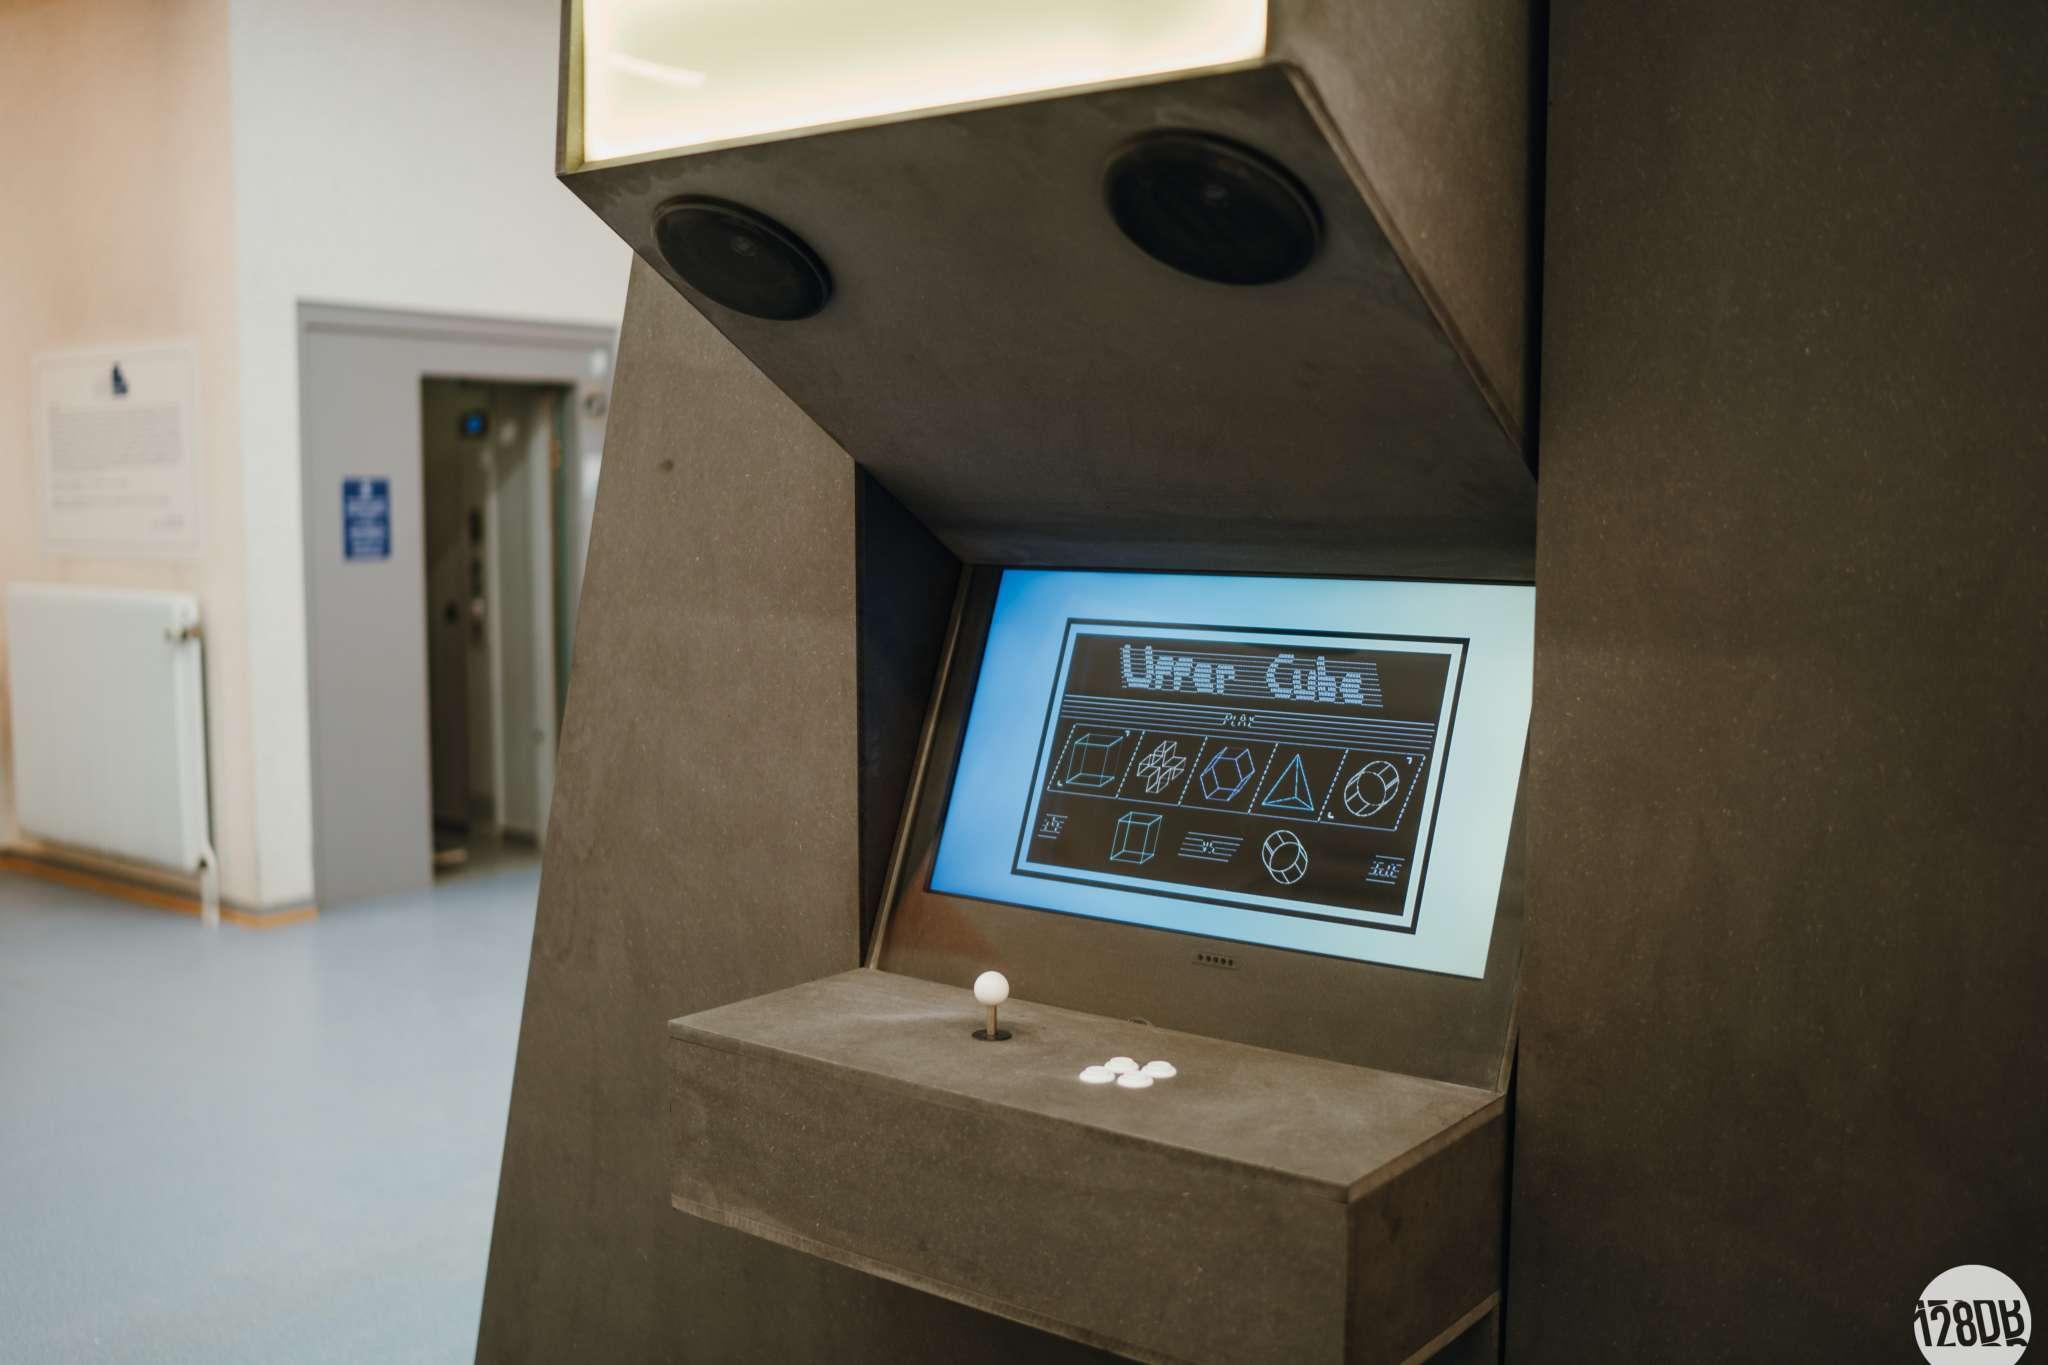 17-02-24-inauguration-pixel-museum-bartosch-salmanski-128db-fr-0034